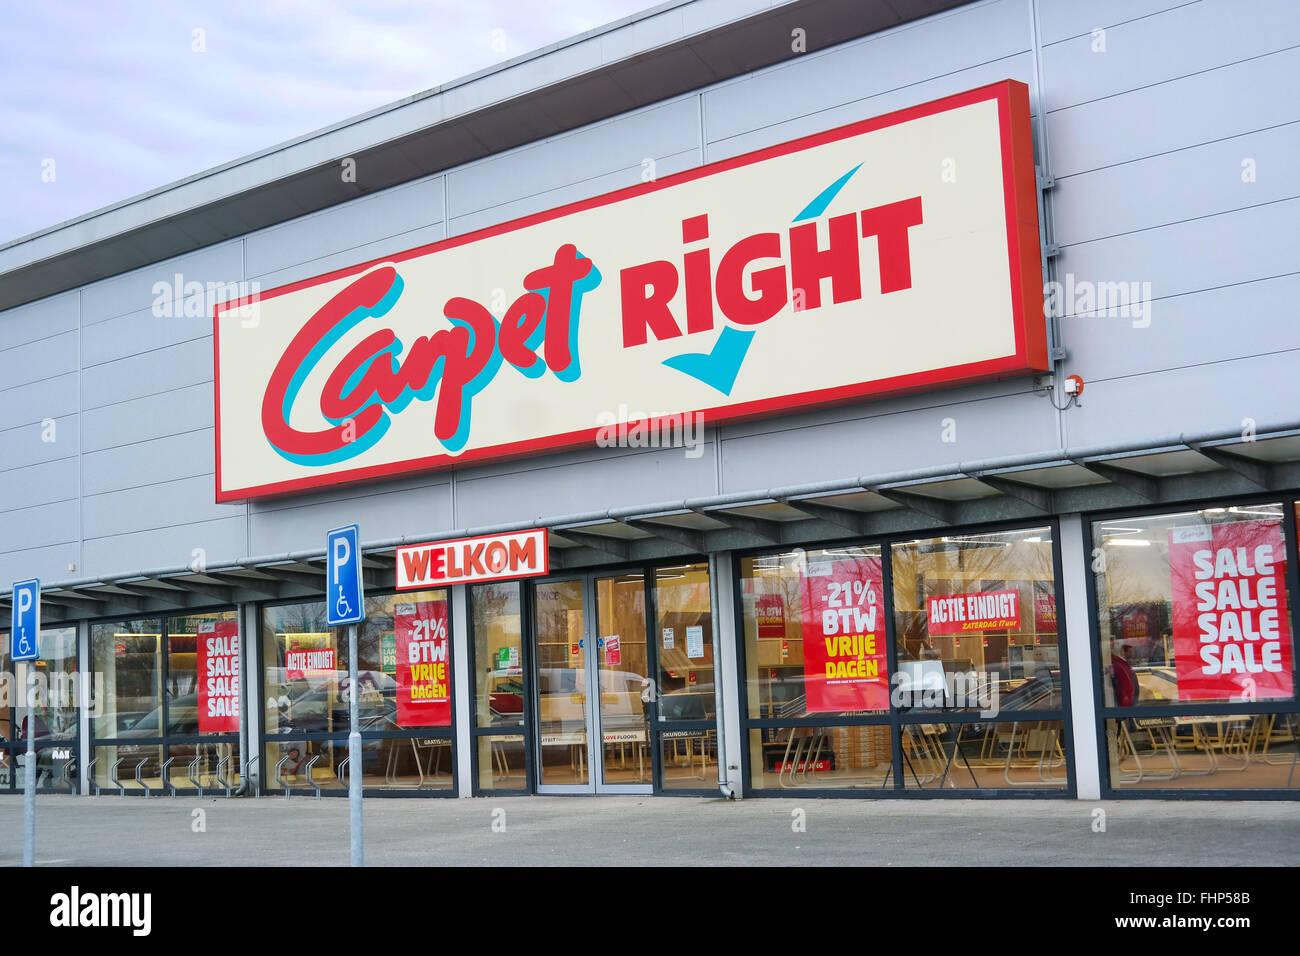 Branch of Carpetright retail chain who sells carpets laminate flooring  vinyl flooring  Branch Of Carpetright. Carpetright Laminate Flooring